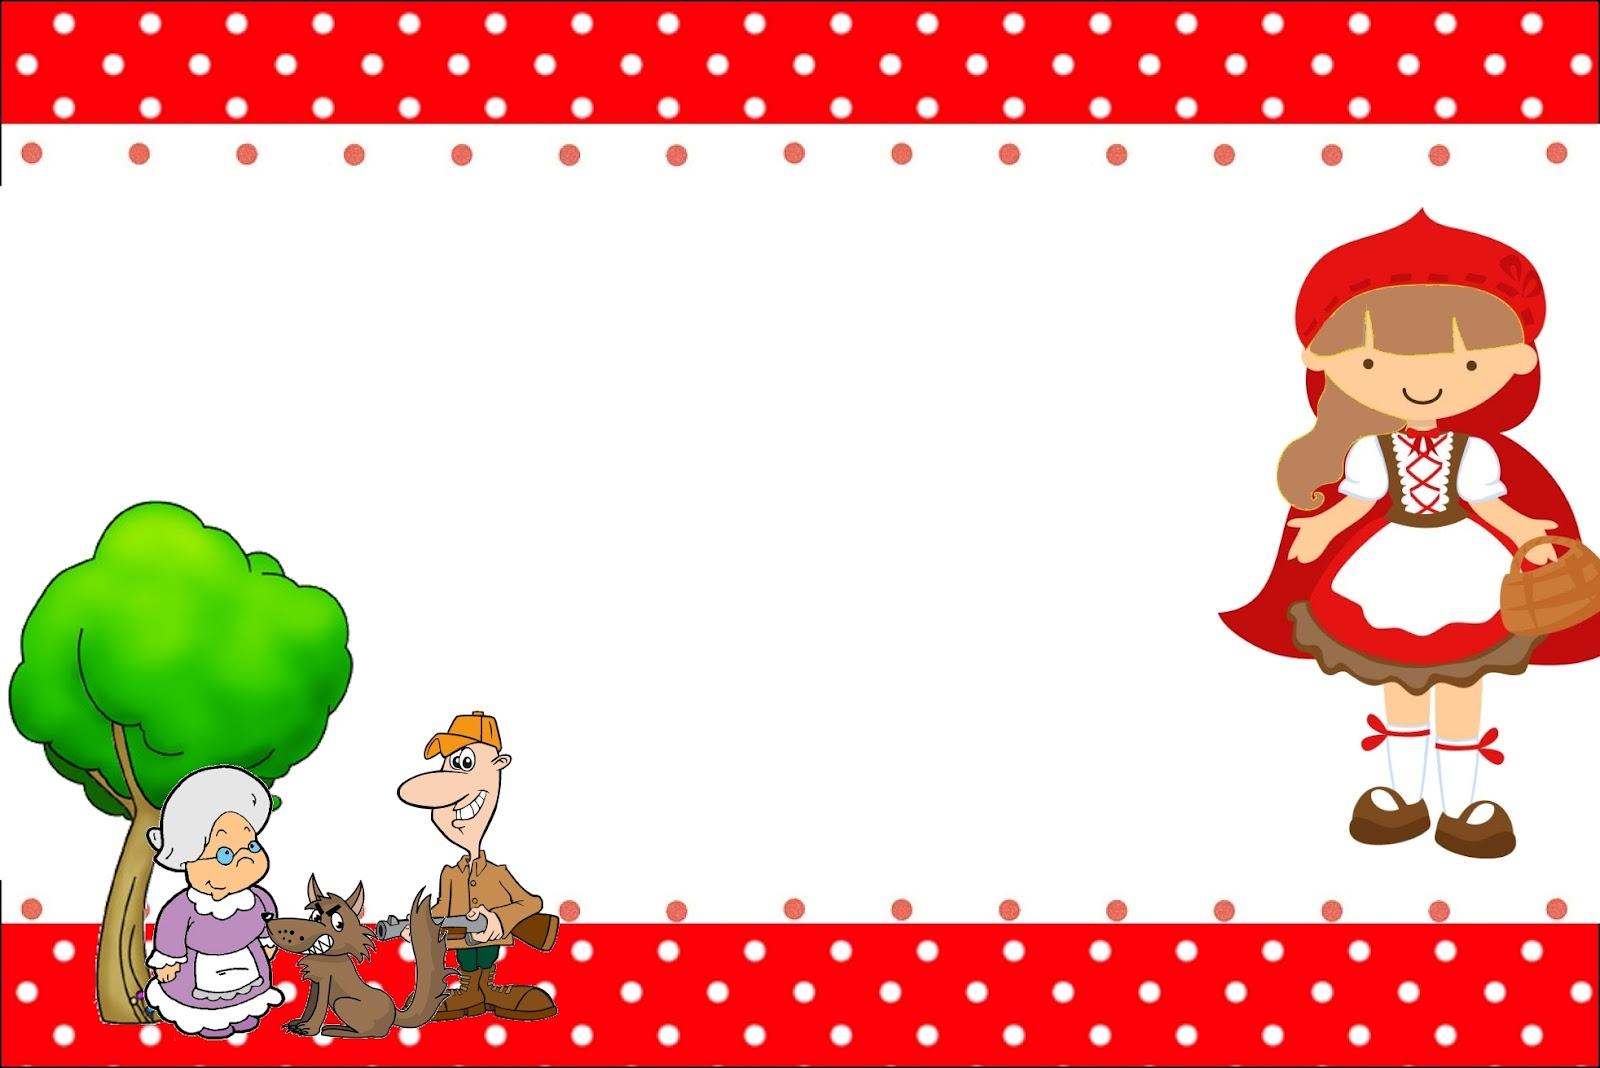 Imprimibles De Caperucita Roja Morena 8 Ideas Y Material